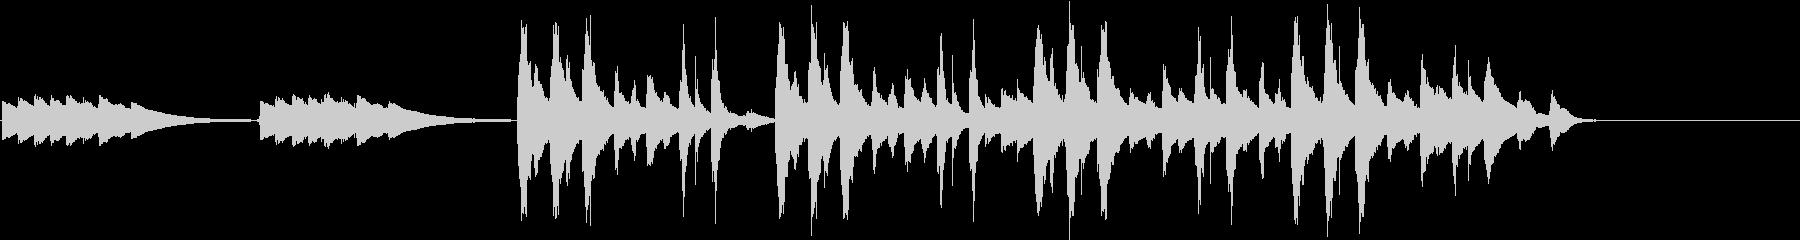 CM音楽ストリングス&オルゴールの未再生の波形